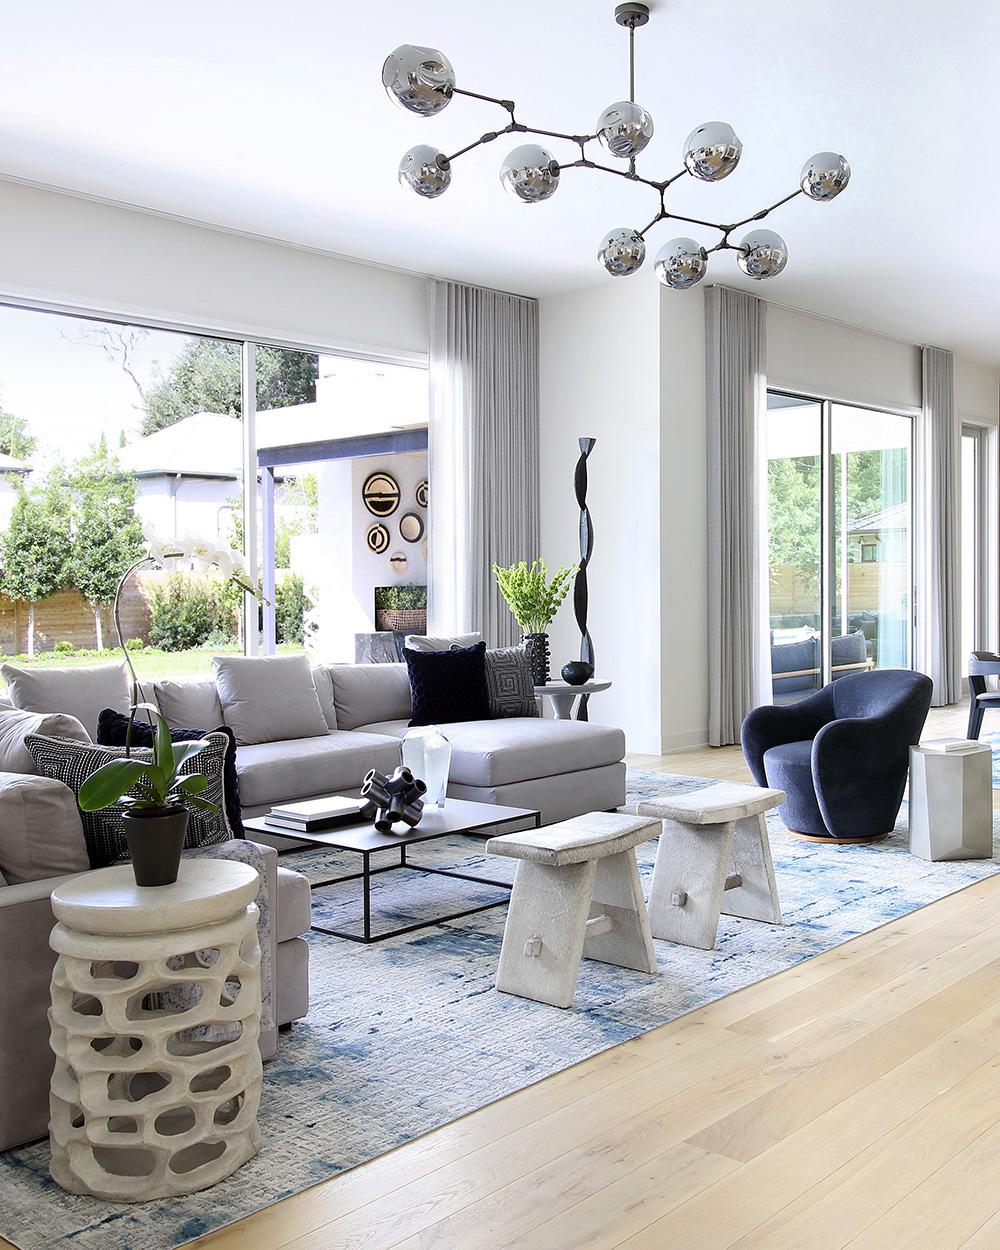 Houston Interior Design Firm: Benjamin Johnston Design